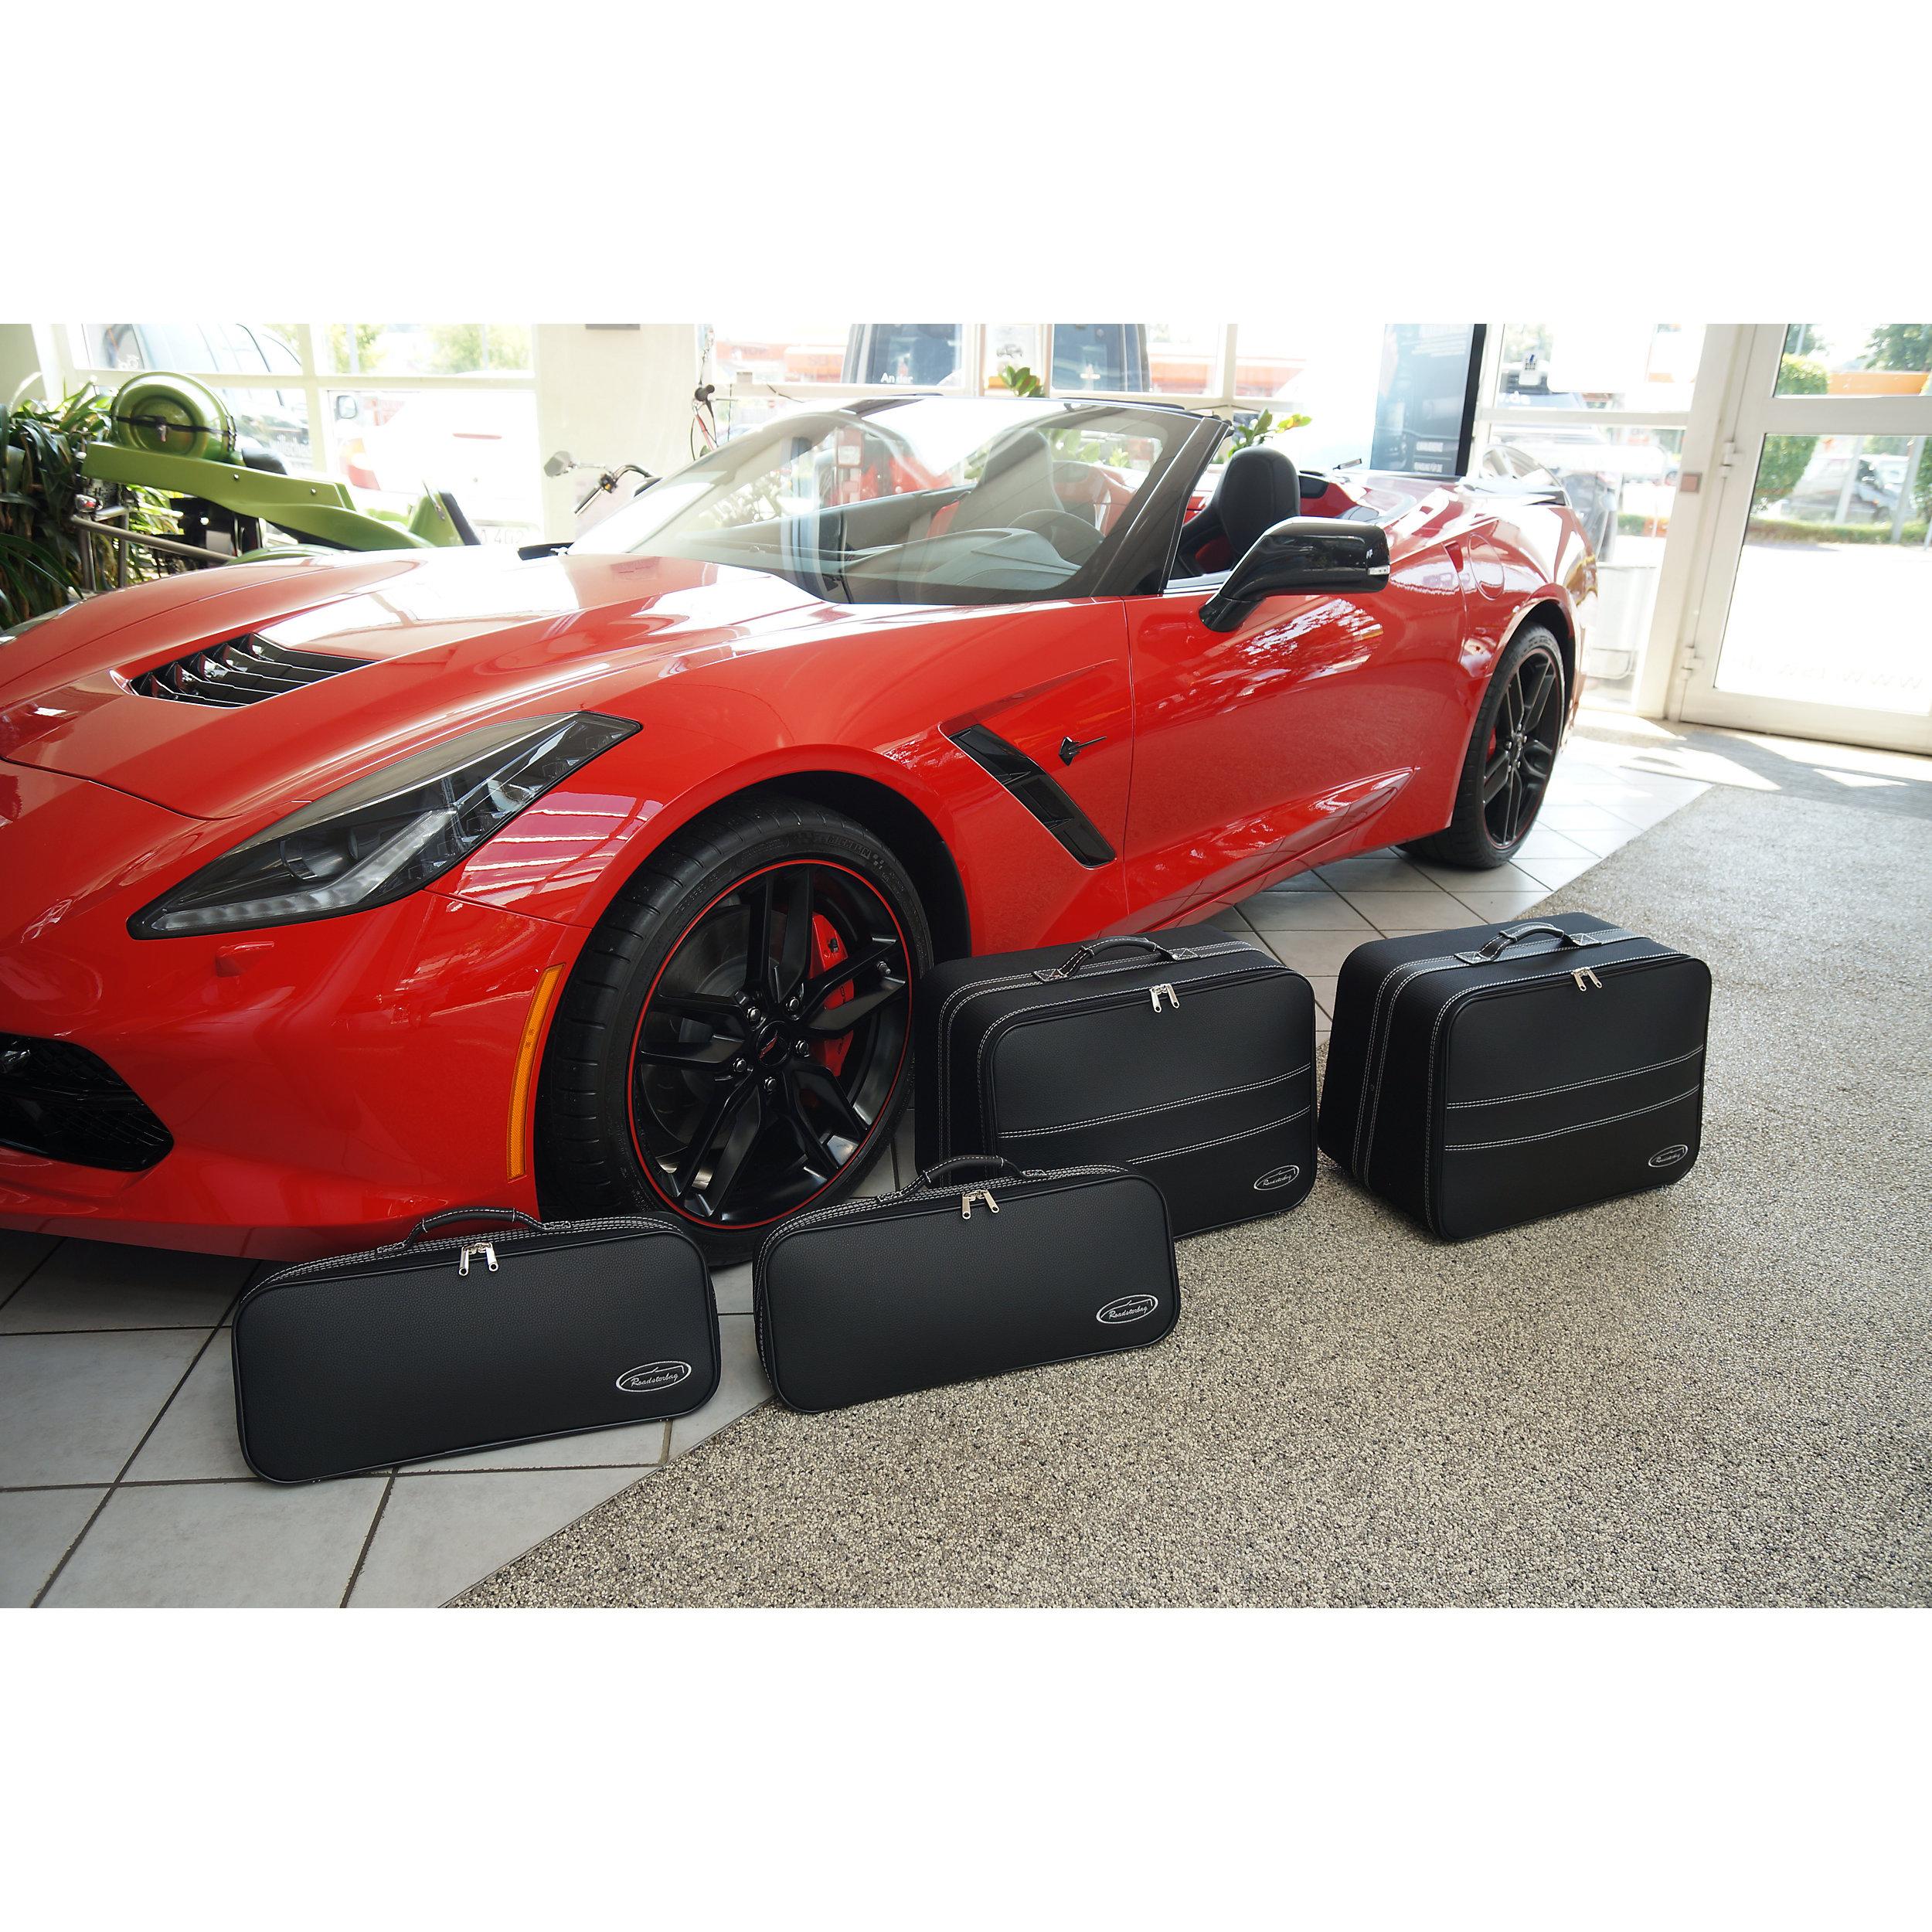 4-tlg. Kofferset Chevrolet Corvette C7 Cabrio 121 Liter